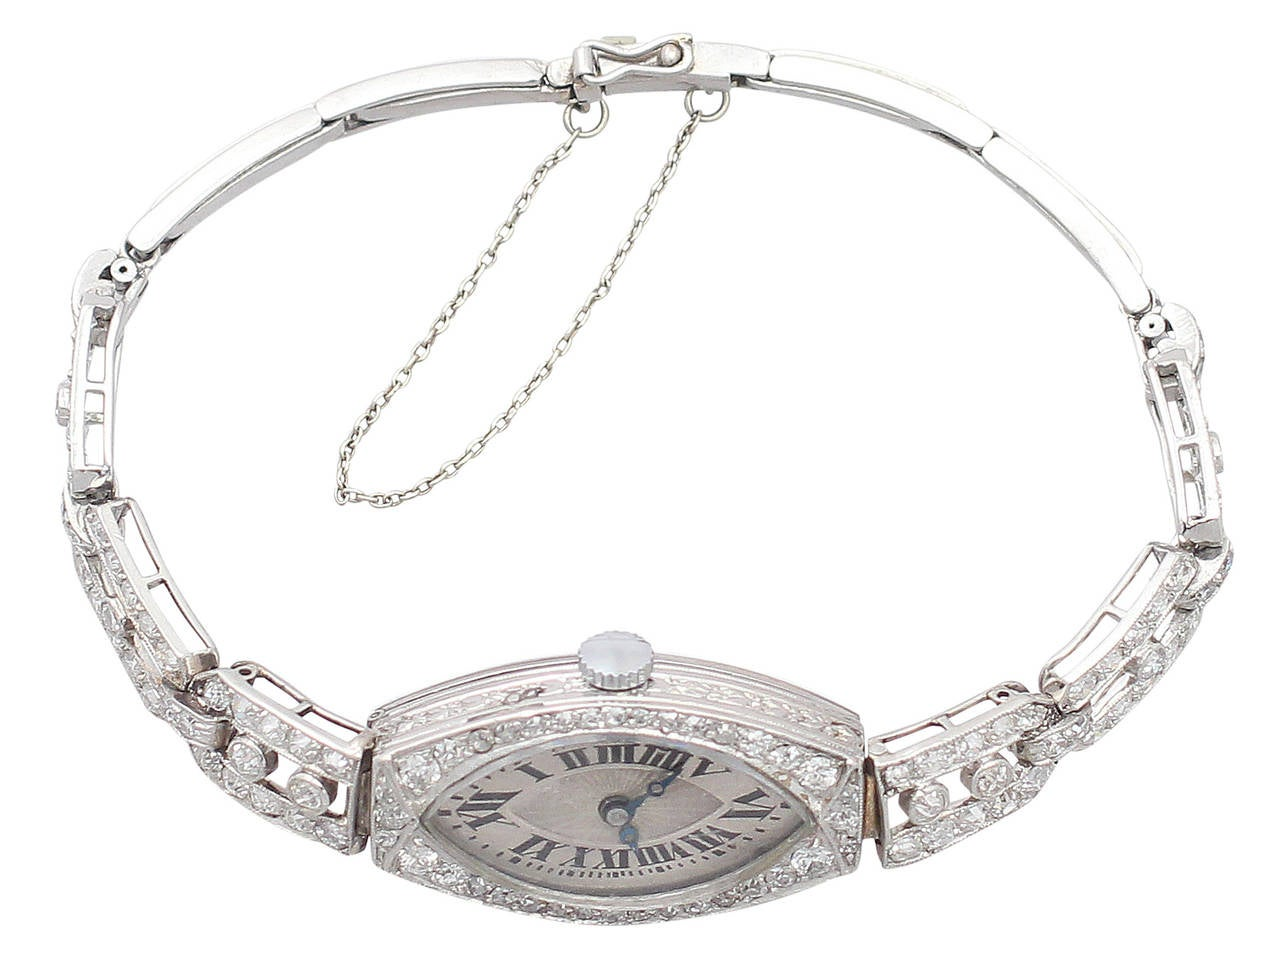 2.02Ct Diamond and Platinum Ladies Cocktail Watch